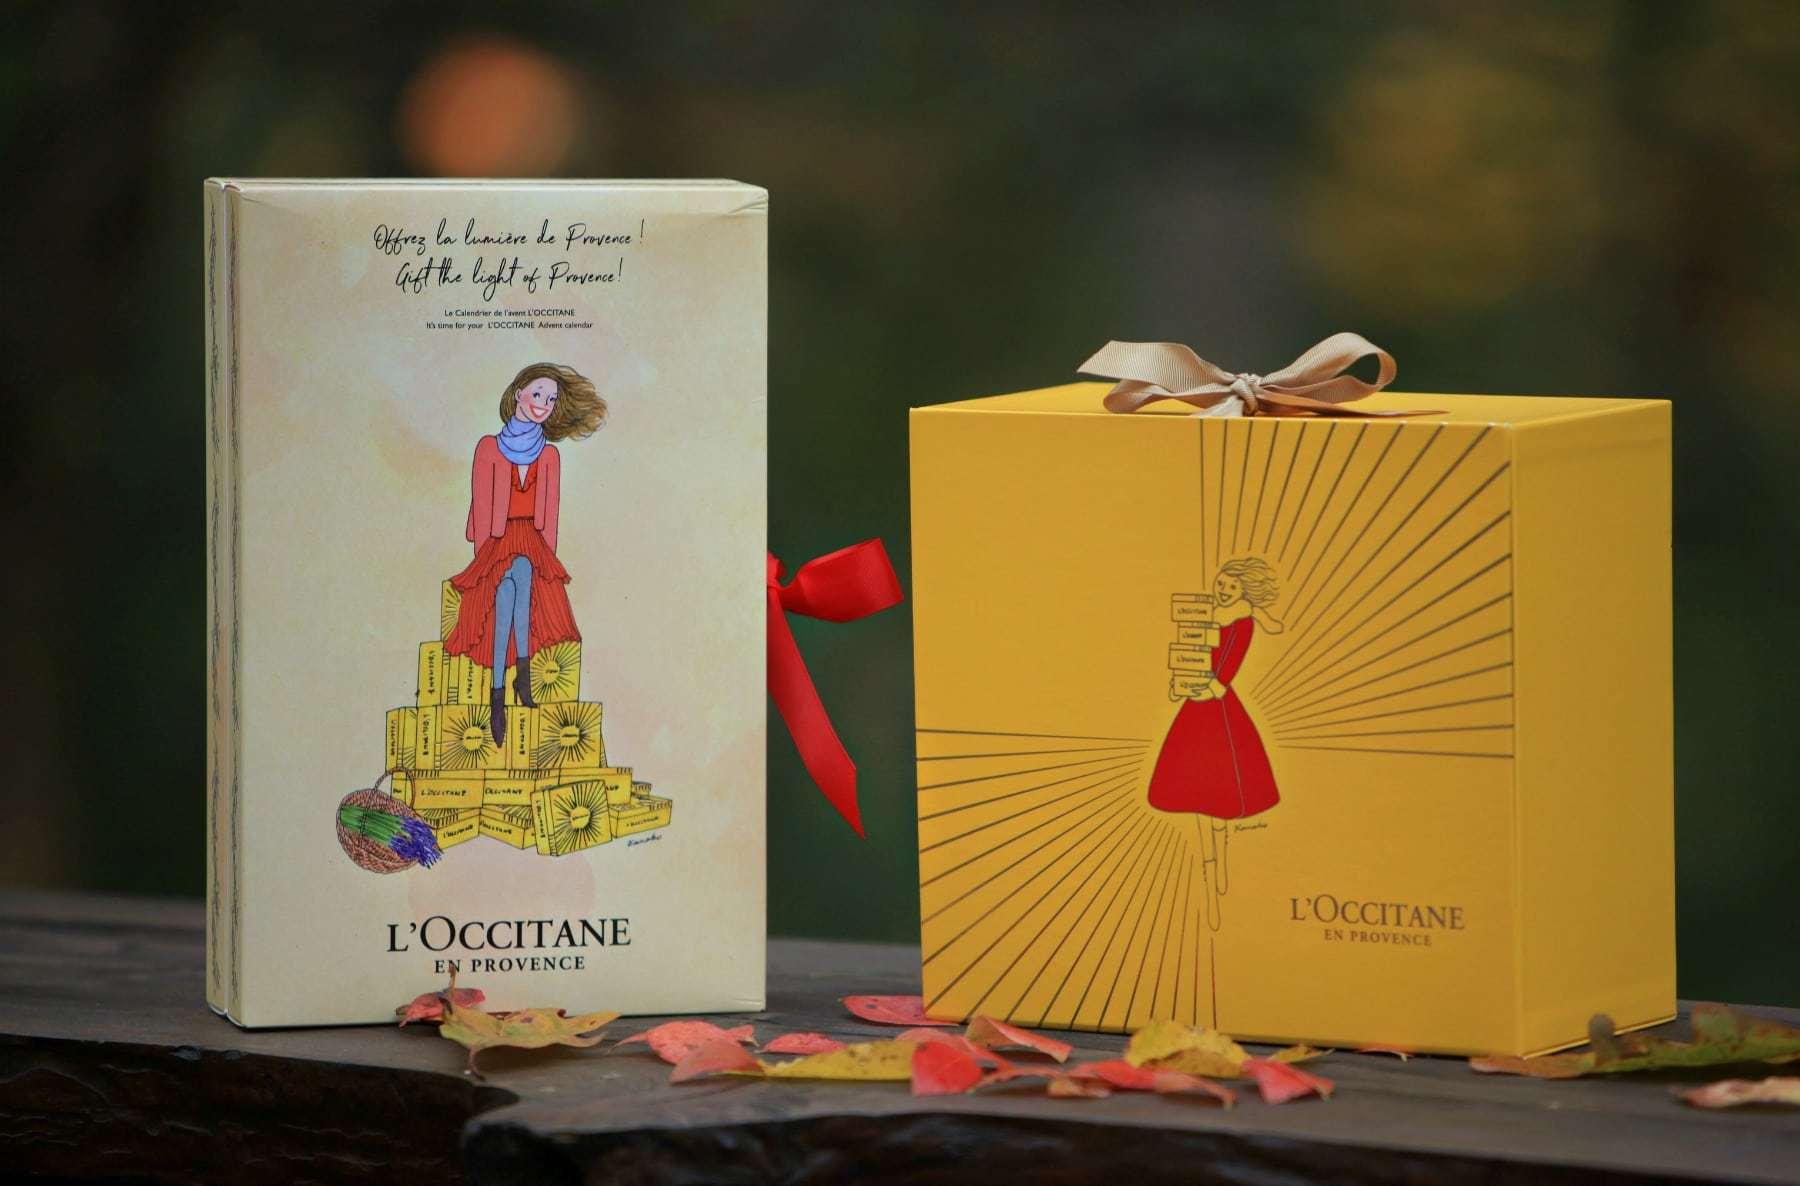 loccitane advent calendar review